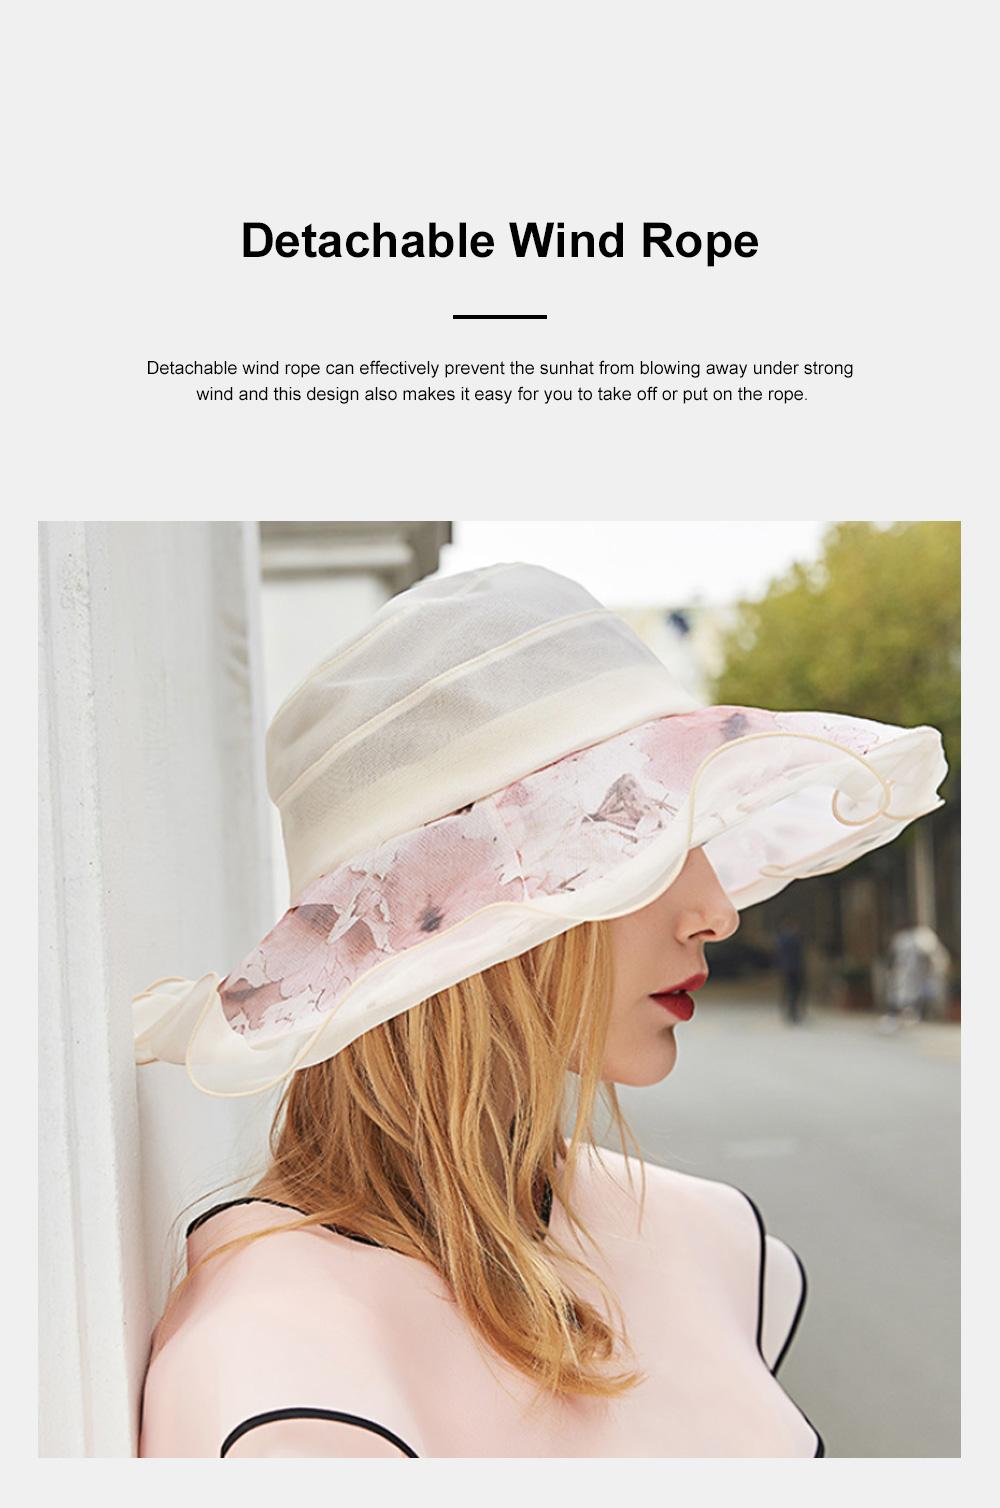 Minimalist Stylish Atmosphere Stereo Flower Model Decorative Foldable Lady Sun Bonnet Hat with Large Brim Wind Rope 5